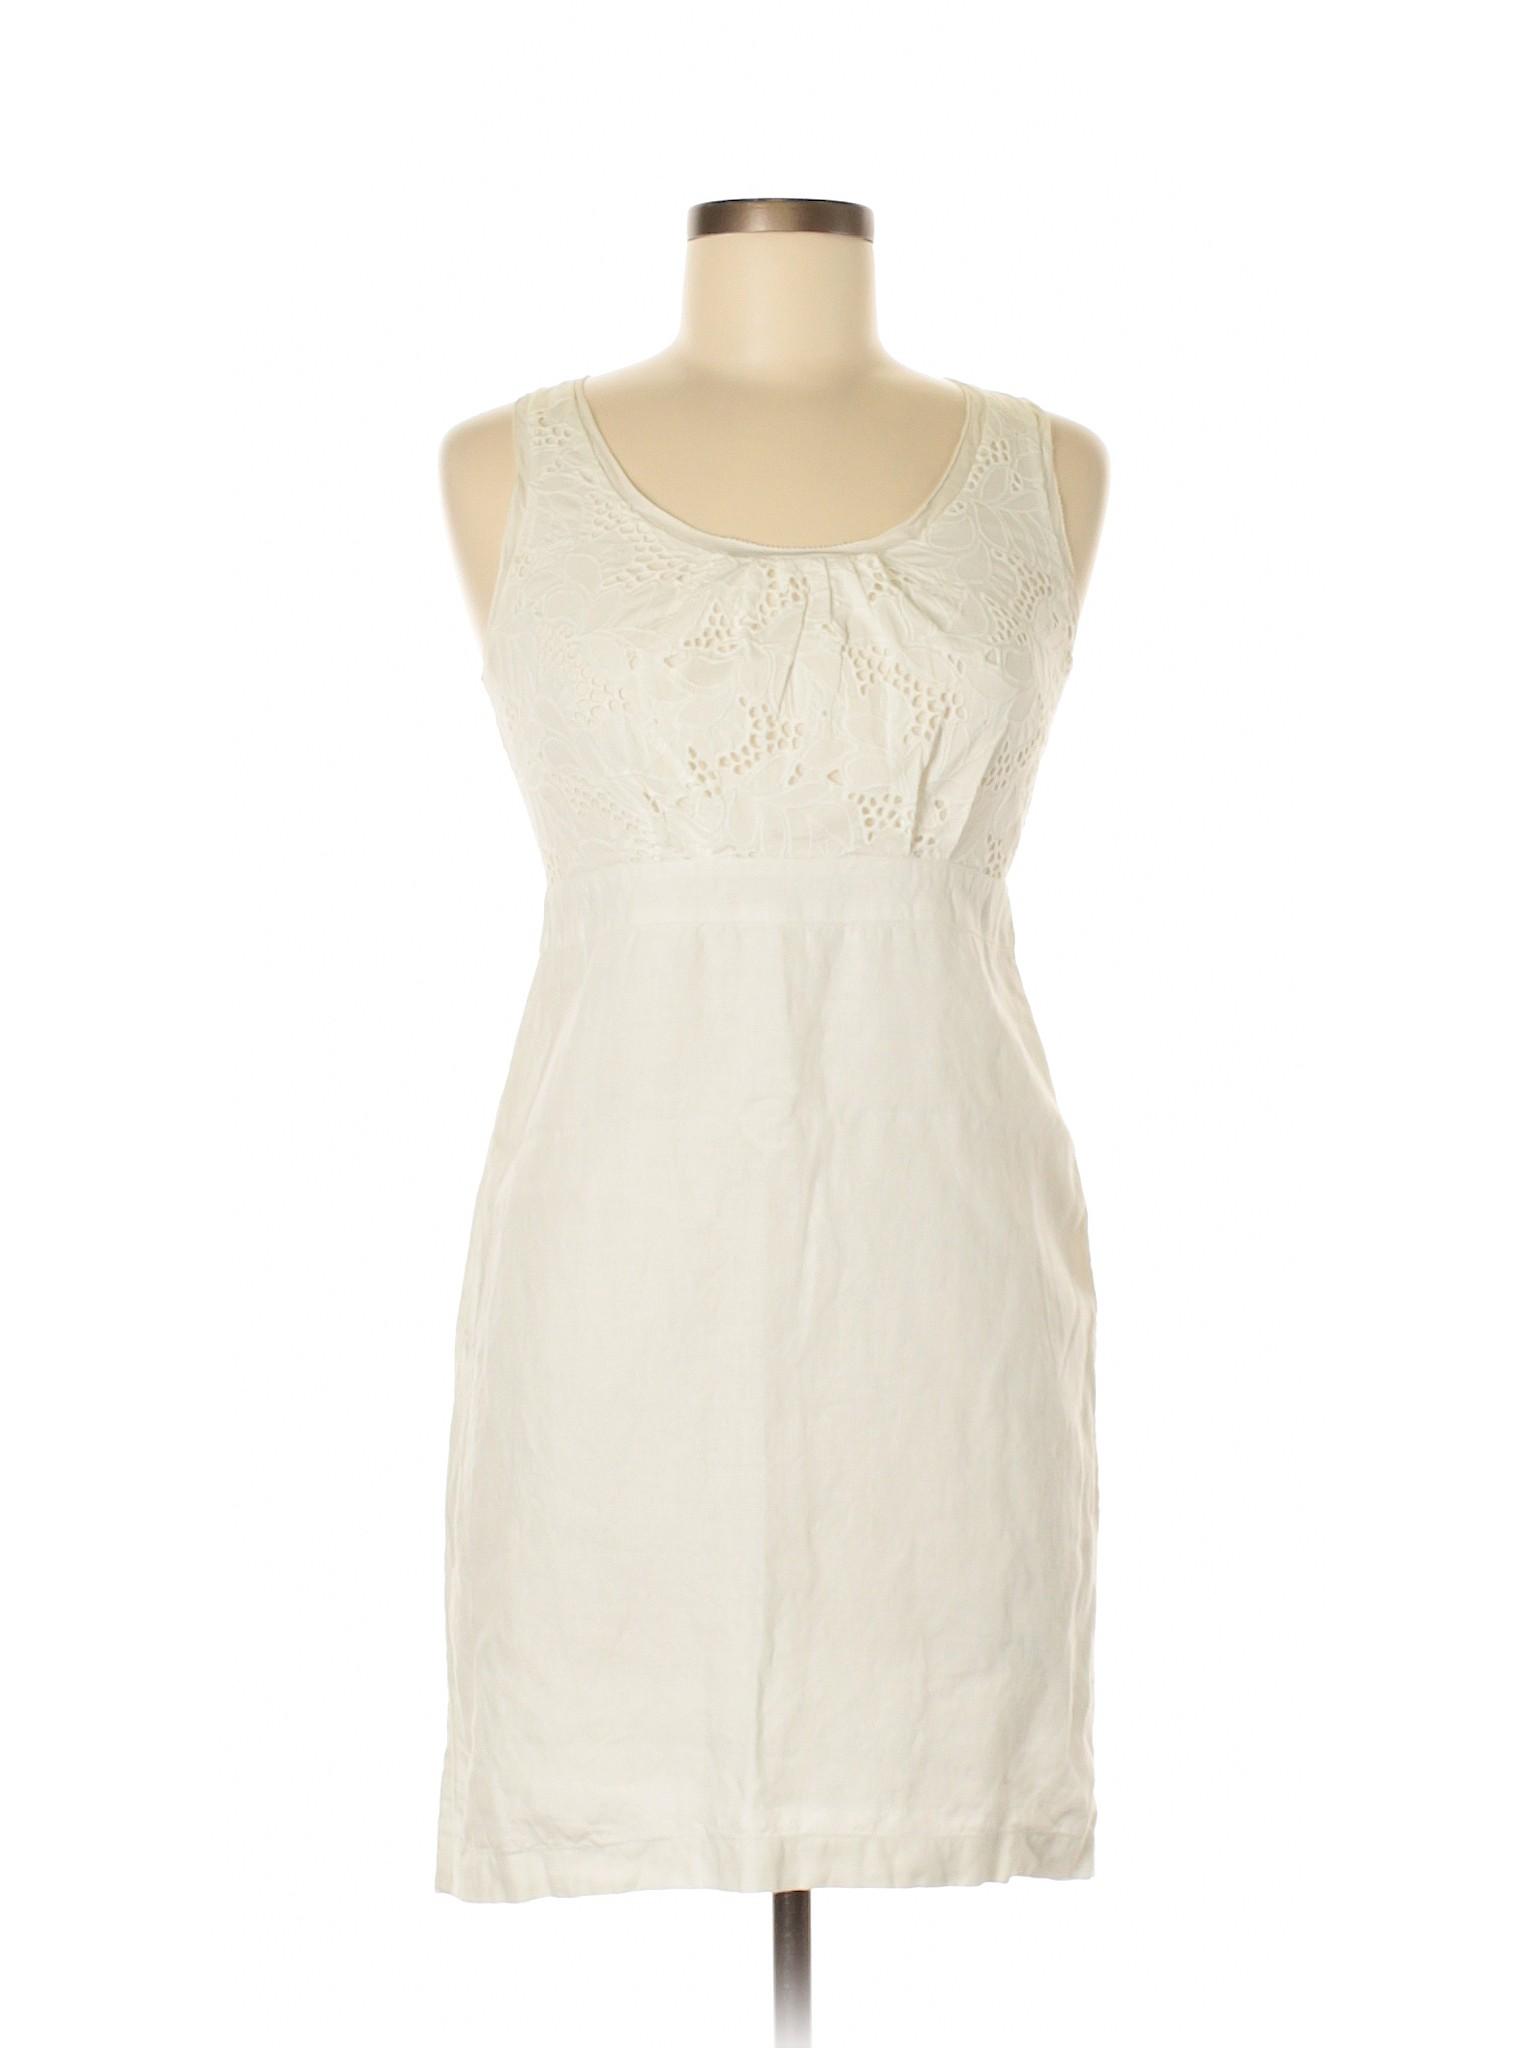 Dress Casual Taylor LOFT winter Ann Boutique wq8vXxAn